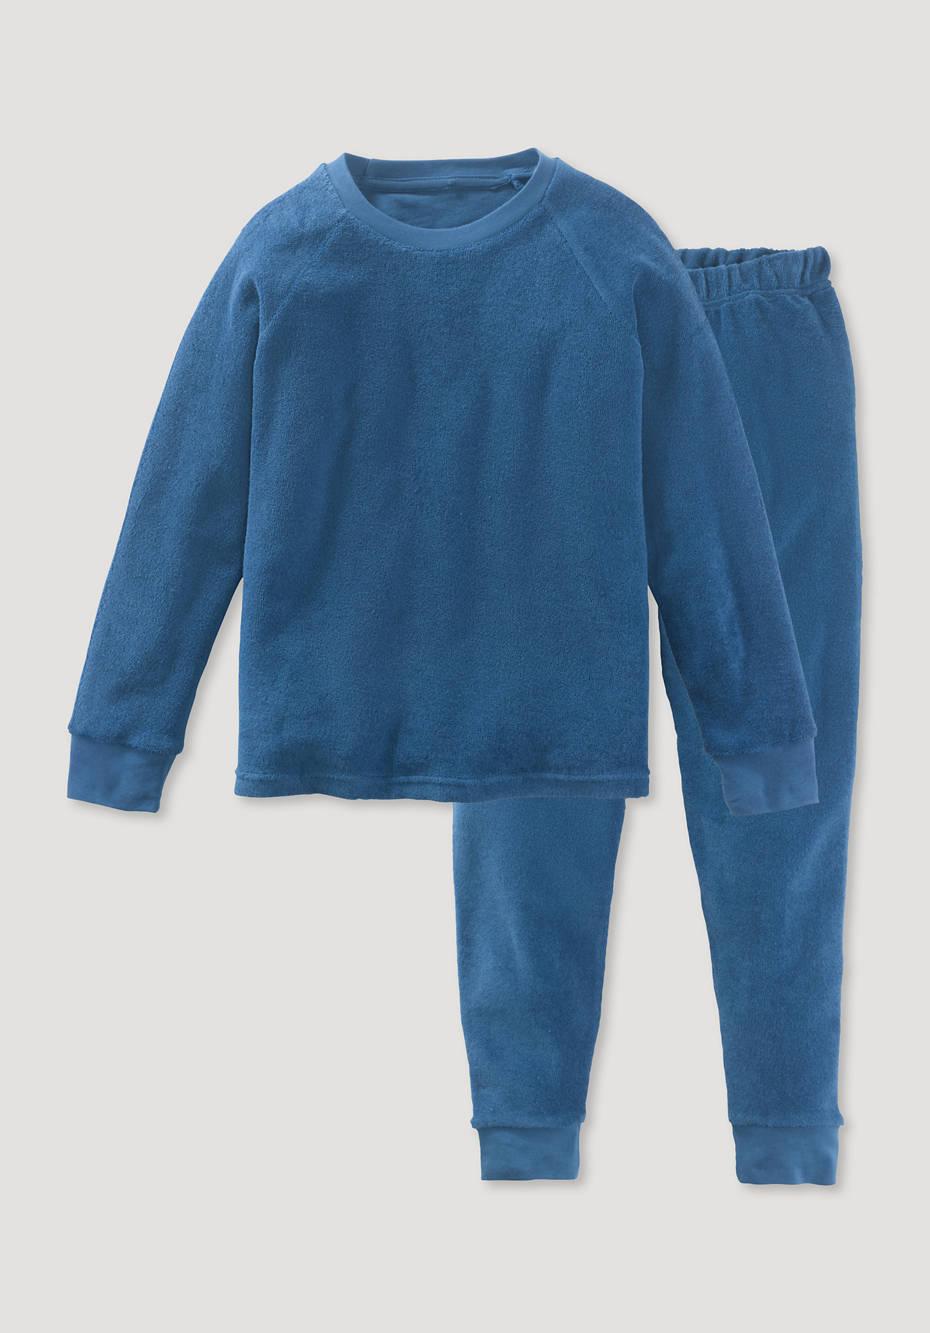 Terrycloth pajamas made from pure organic cotton